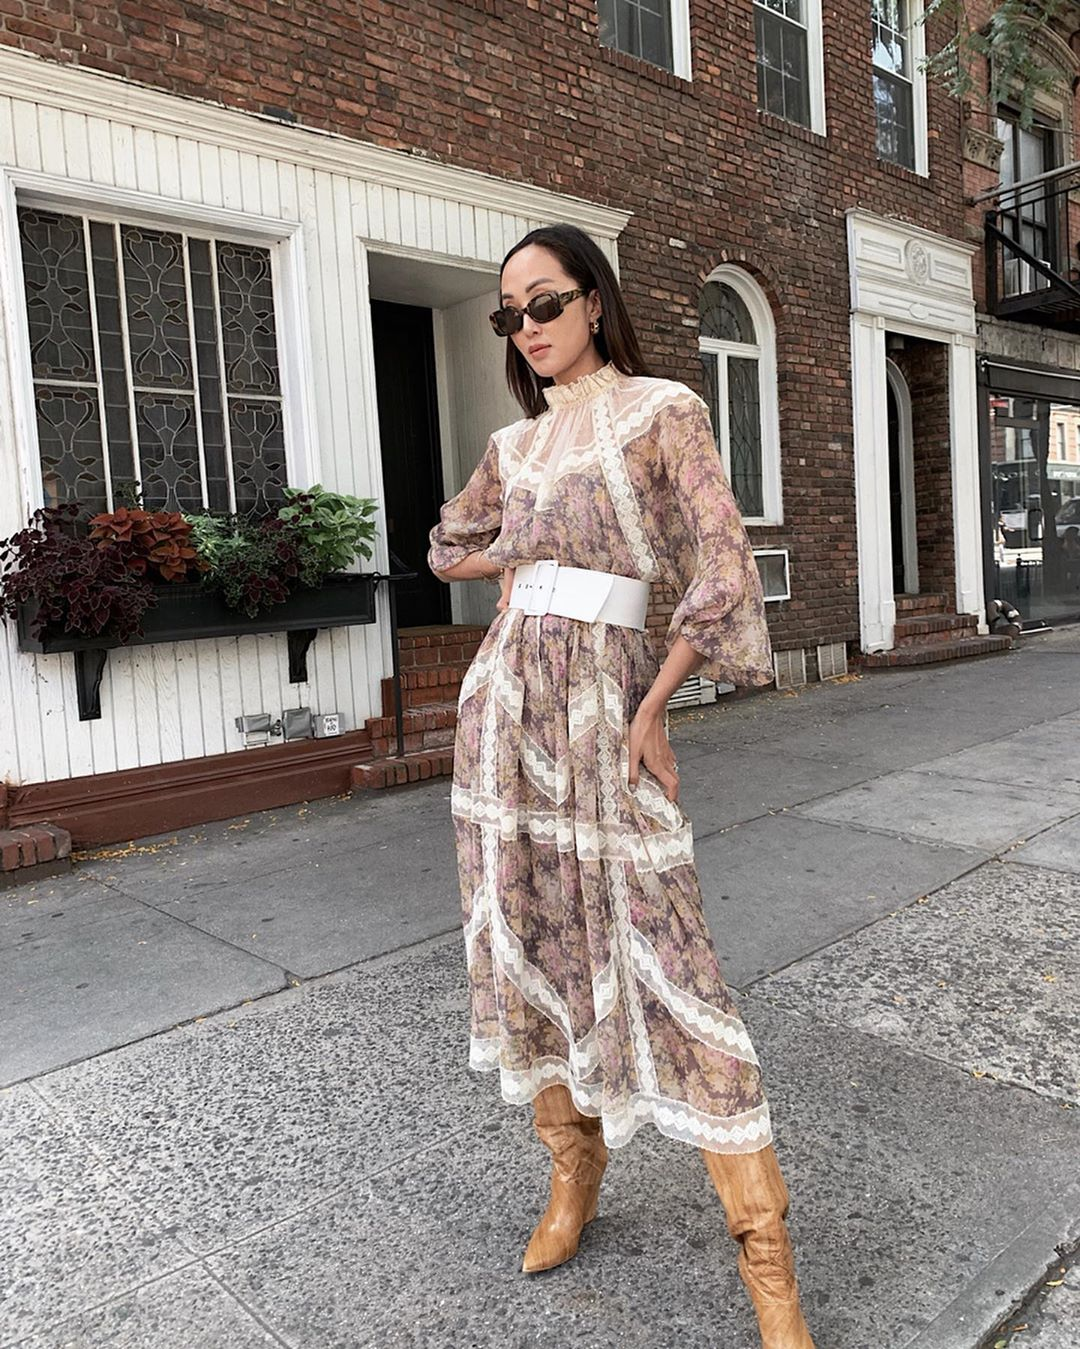 Chriselle Lim mặc đầm xòe voan in hoa